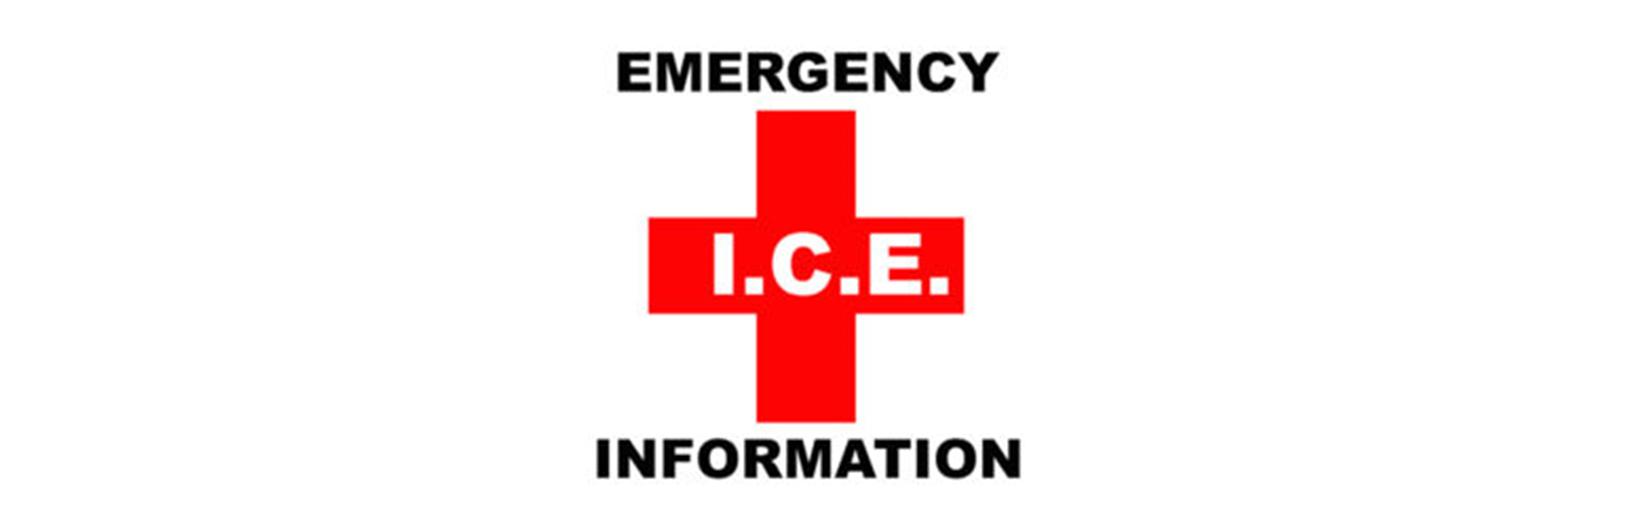 Emergency Preparedness Toolkit